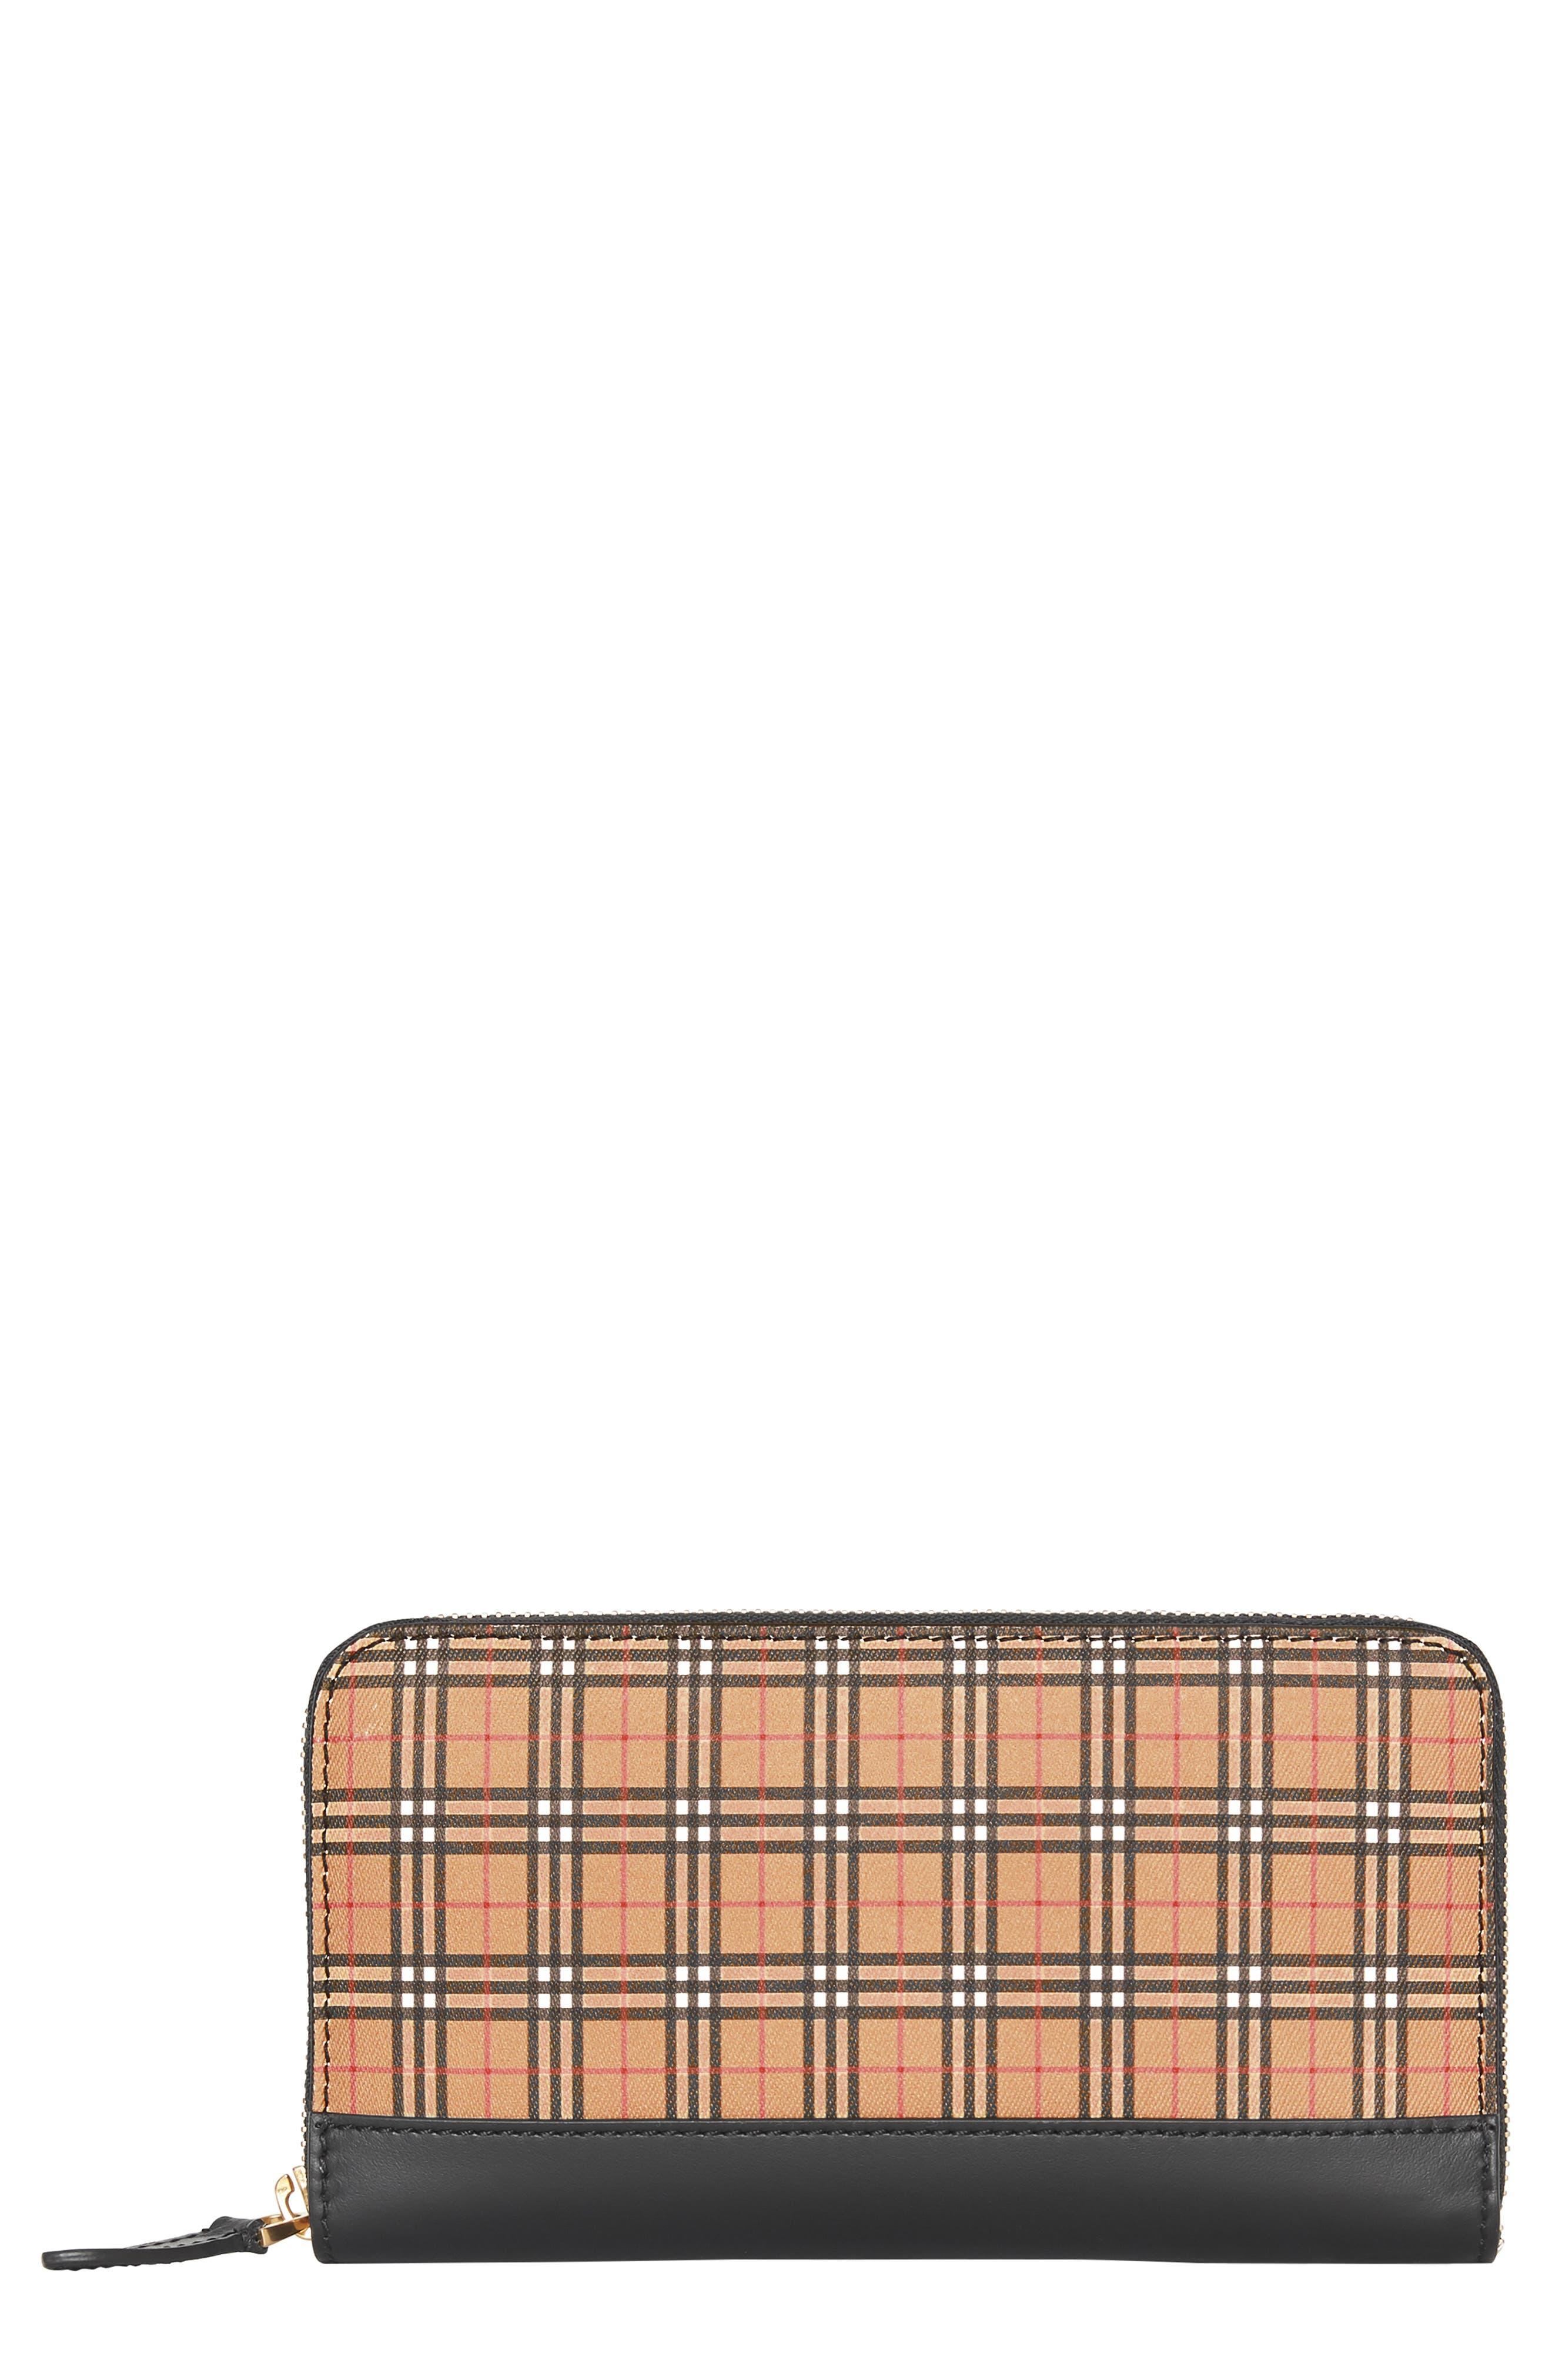 Mini Vintage Canvas Check & Leather Zip Around Wallet,                             Main thumbnail 1, color,                             ANTIQUE YELLOW